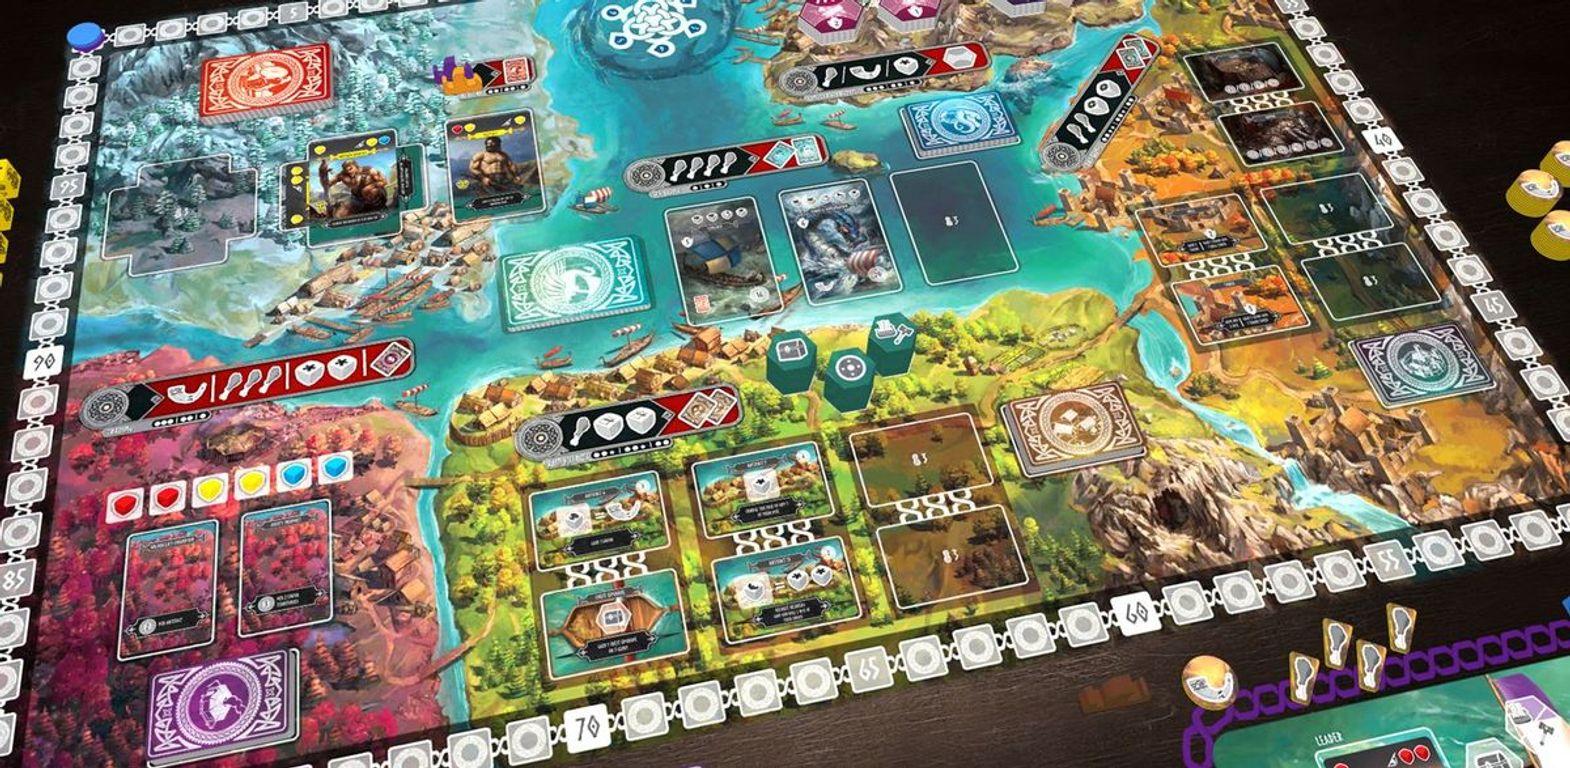 Reavers of Midgard game board